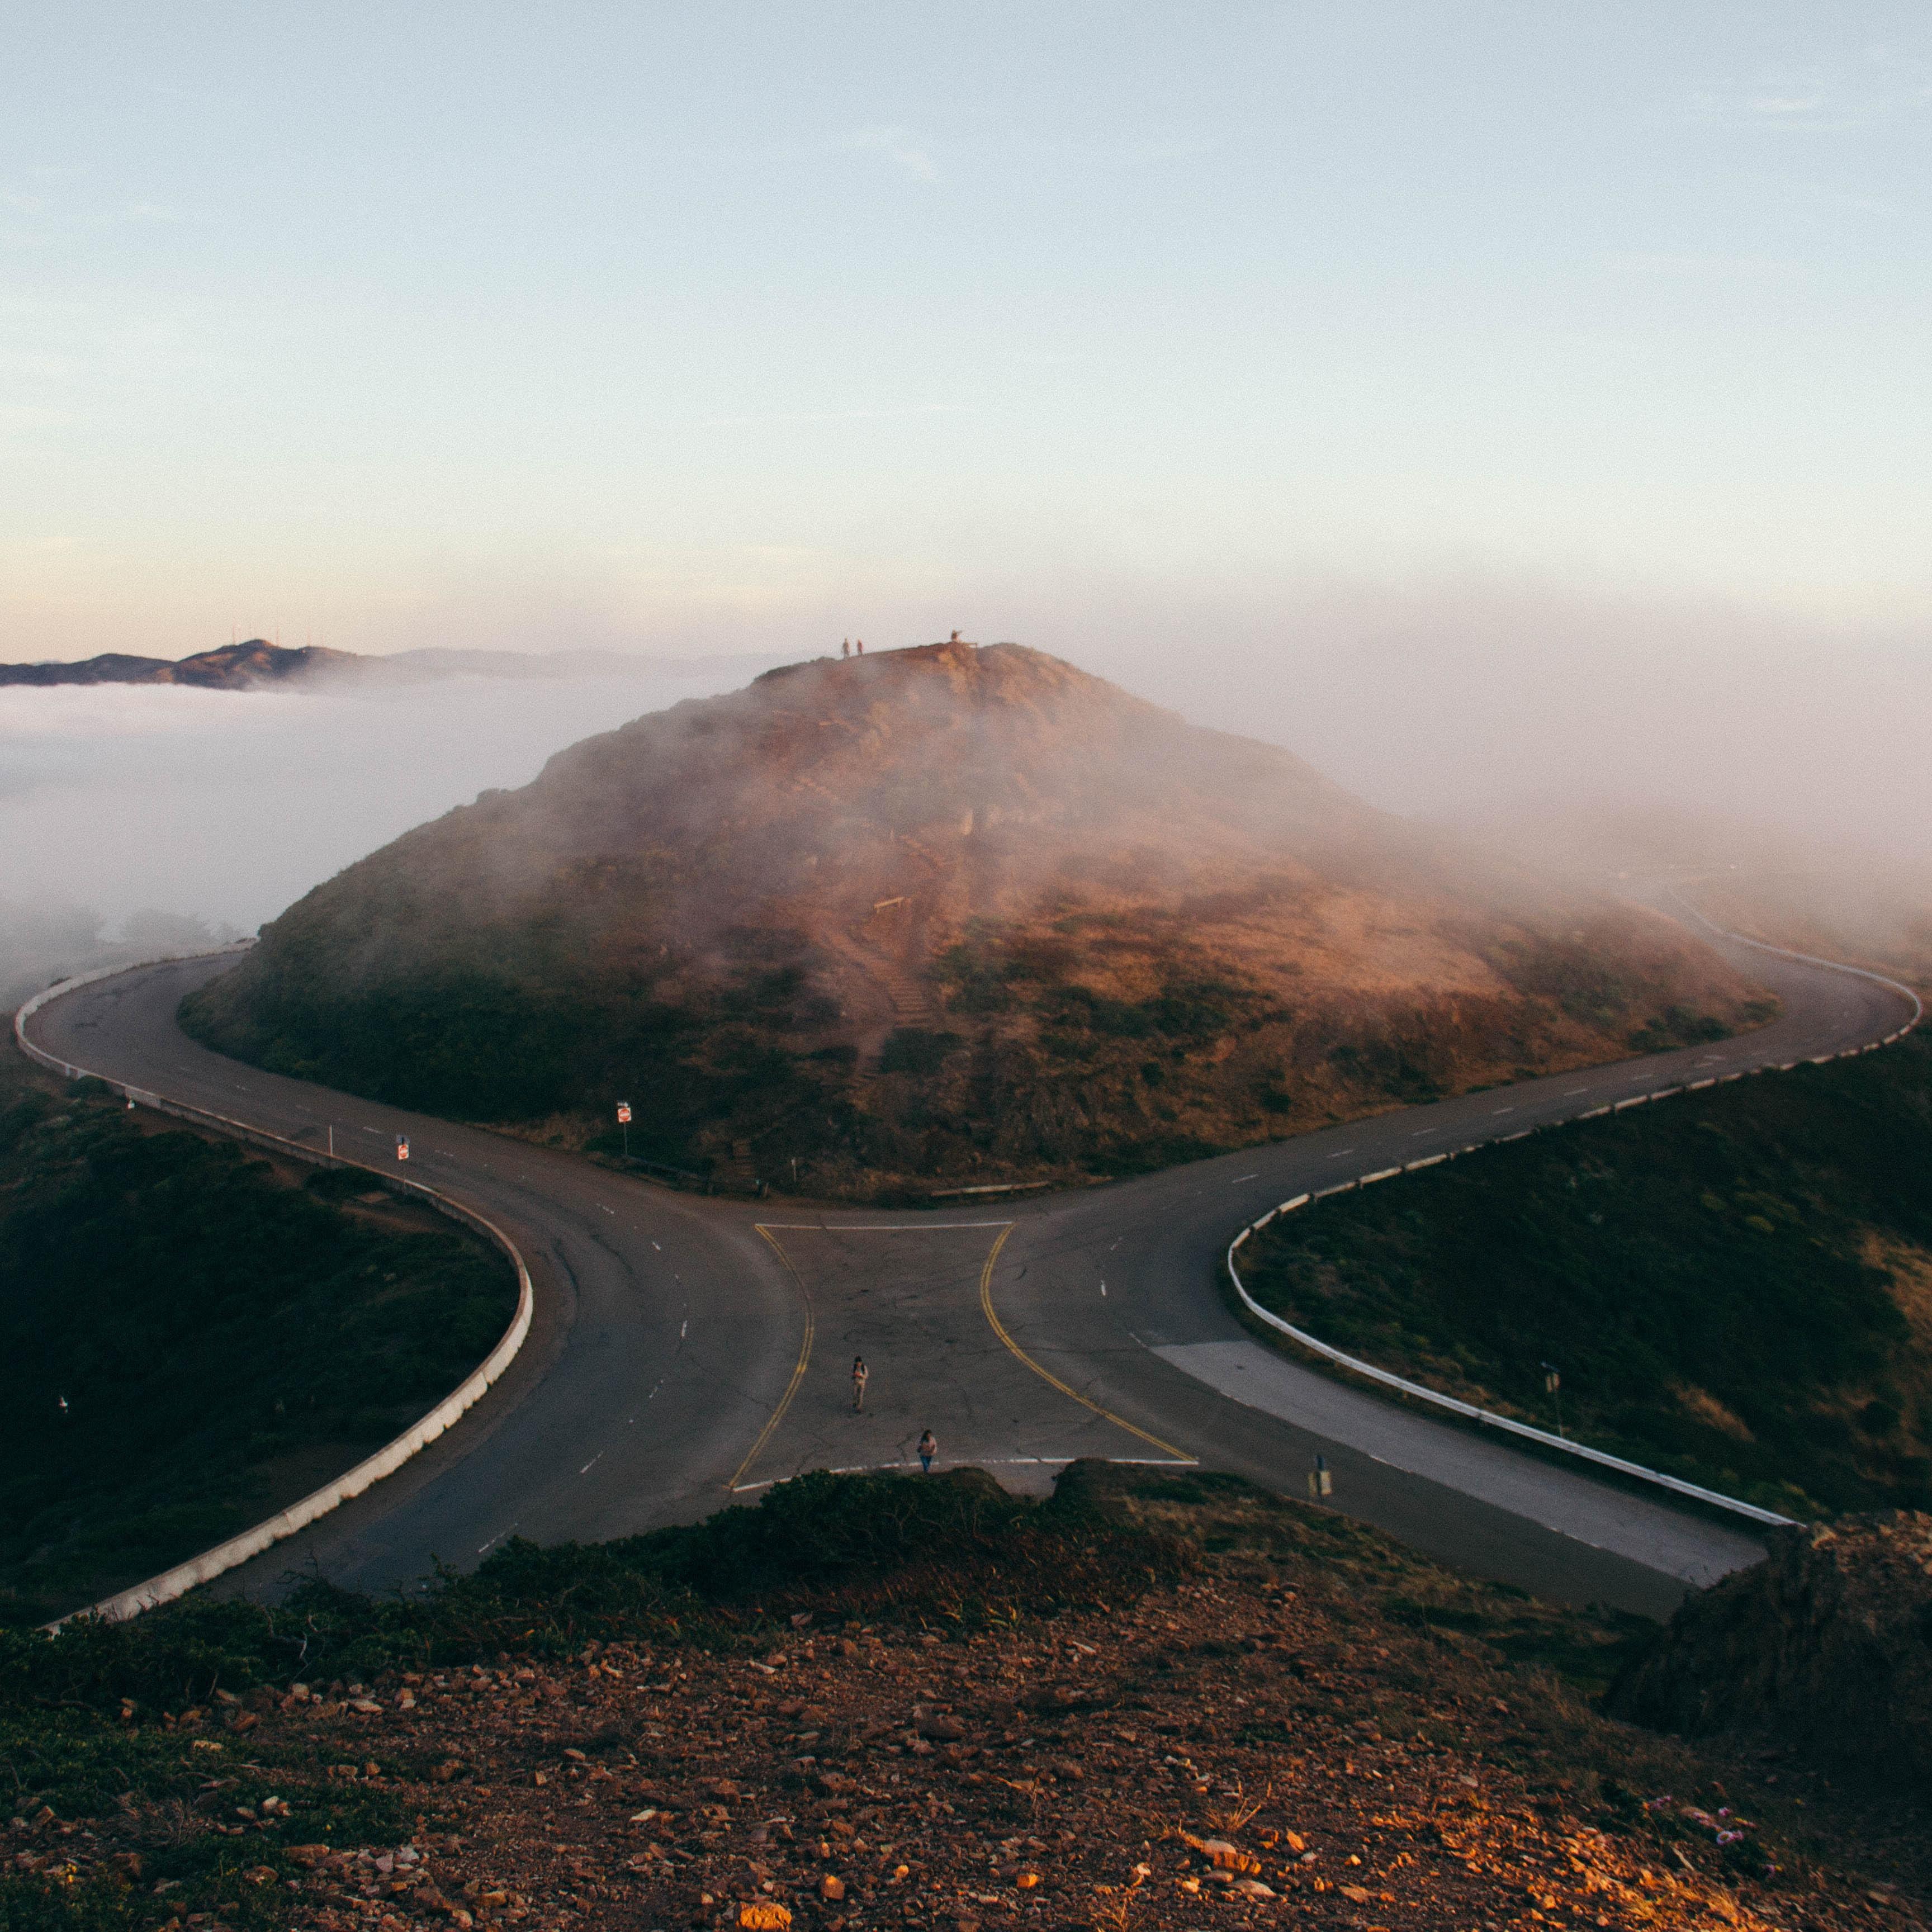 Empty roads circle around a mountain